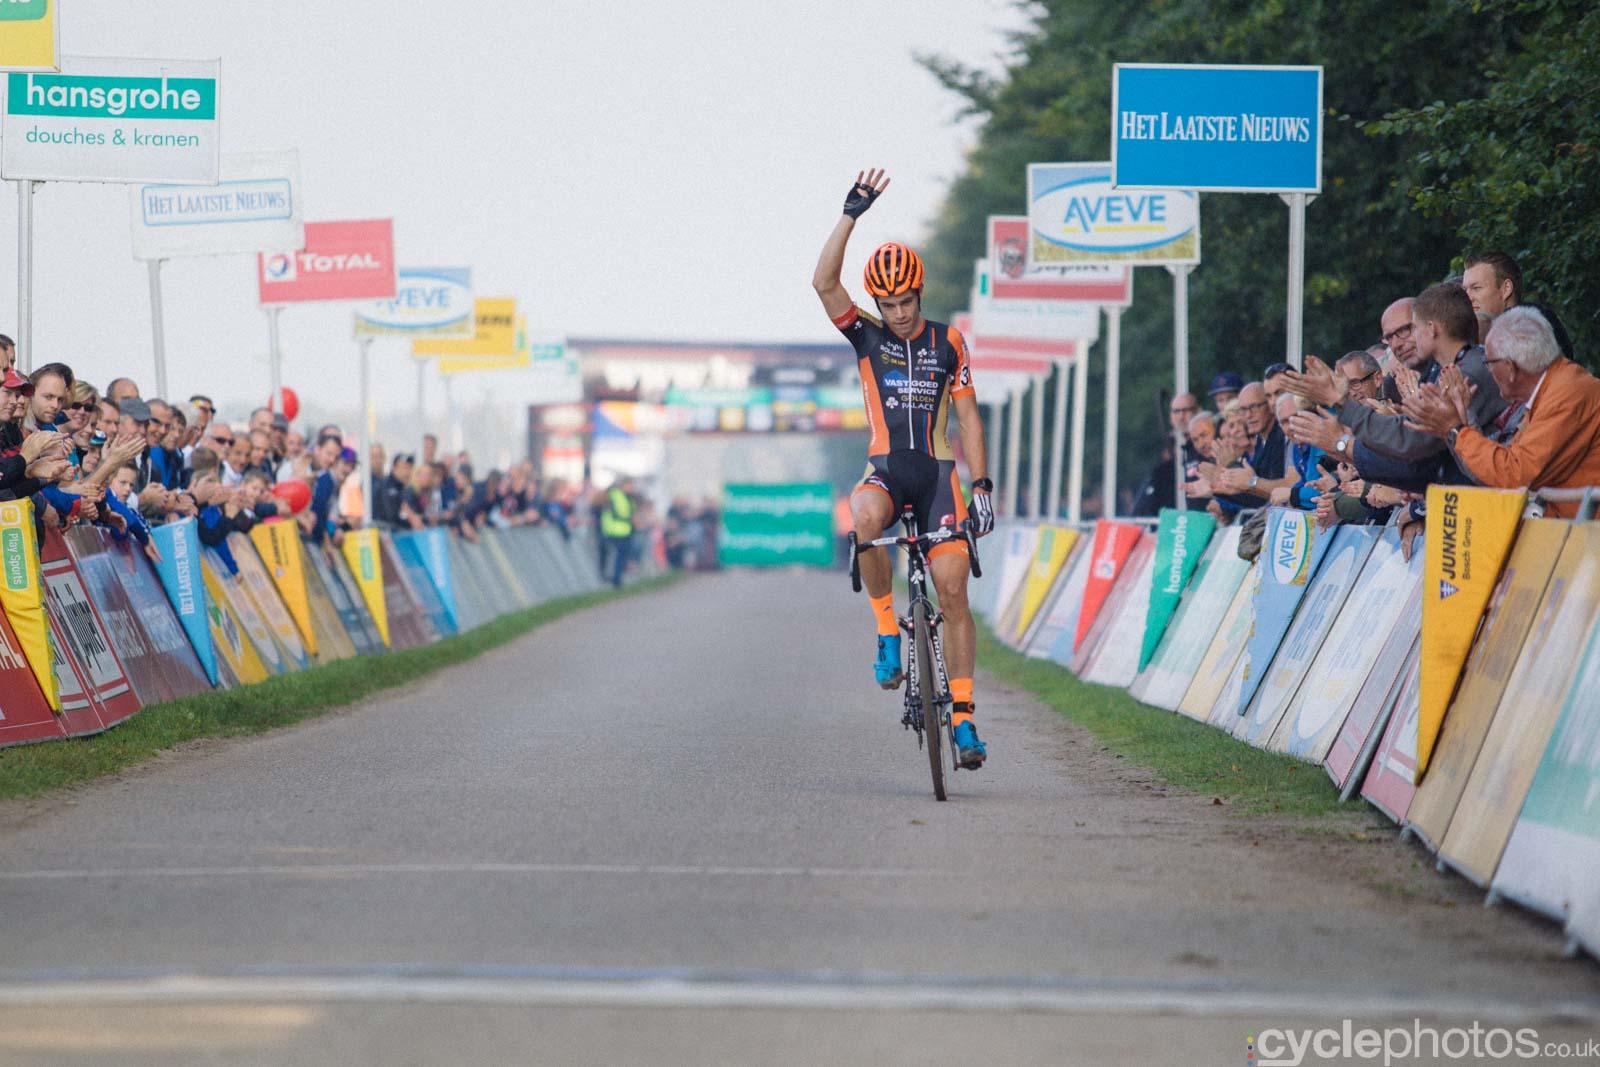 Wout Van Aert rolls over the finish line of the elite men's Superprestige race in Gieten, The Netherlands. All rights reserved. �Balint Hamvas / Cyclephotos